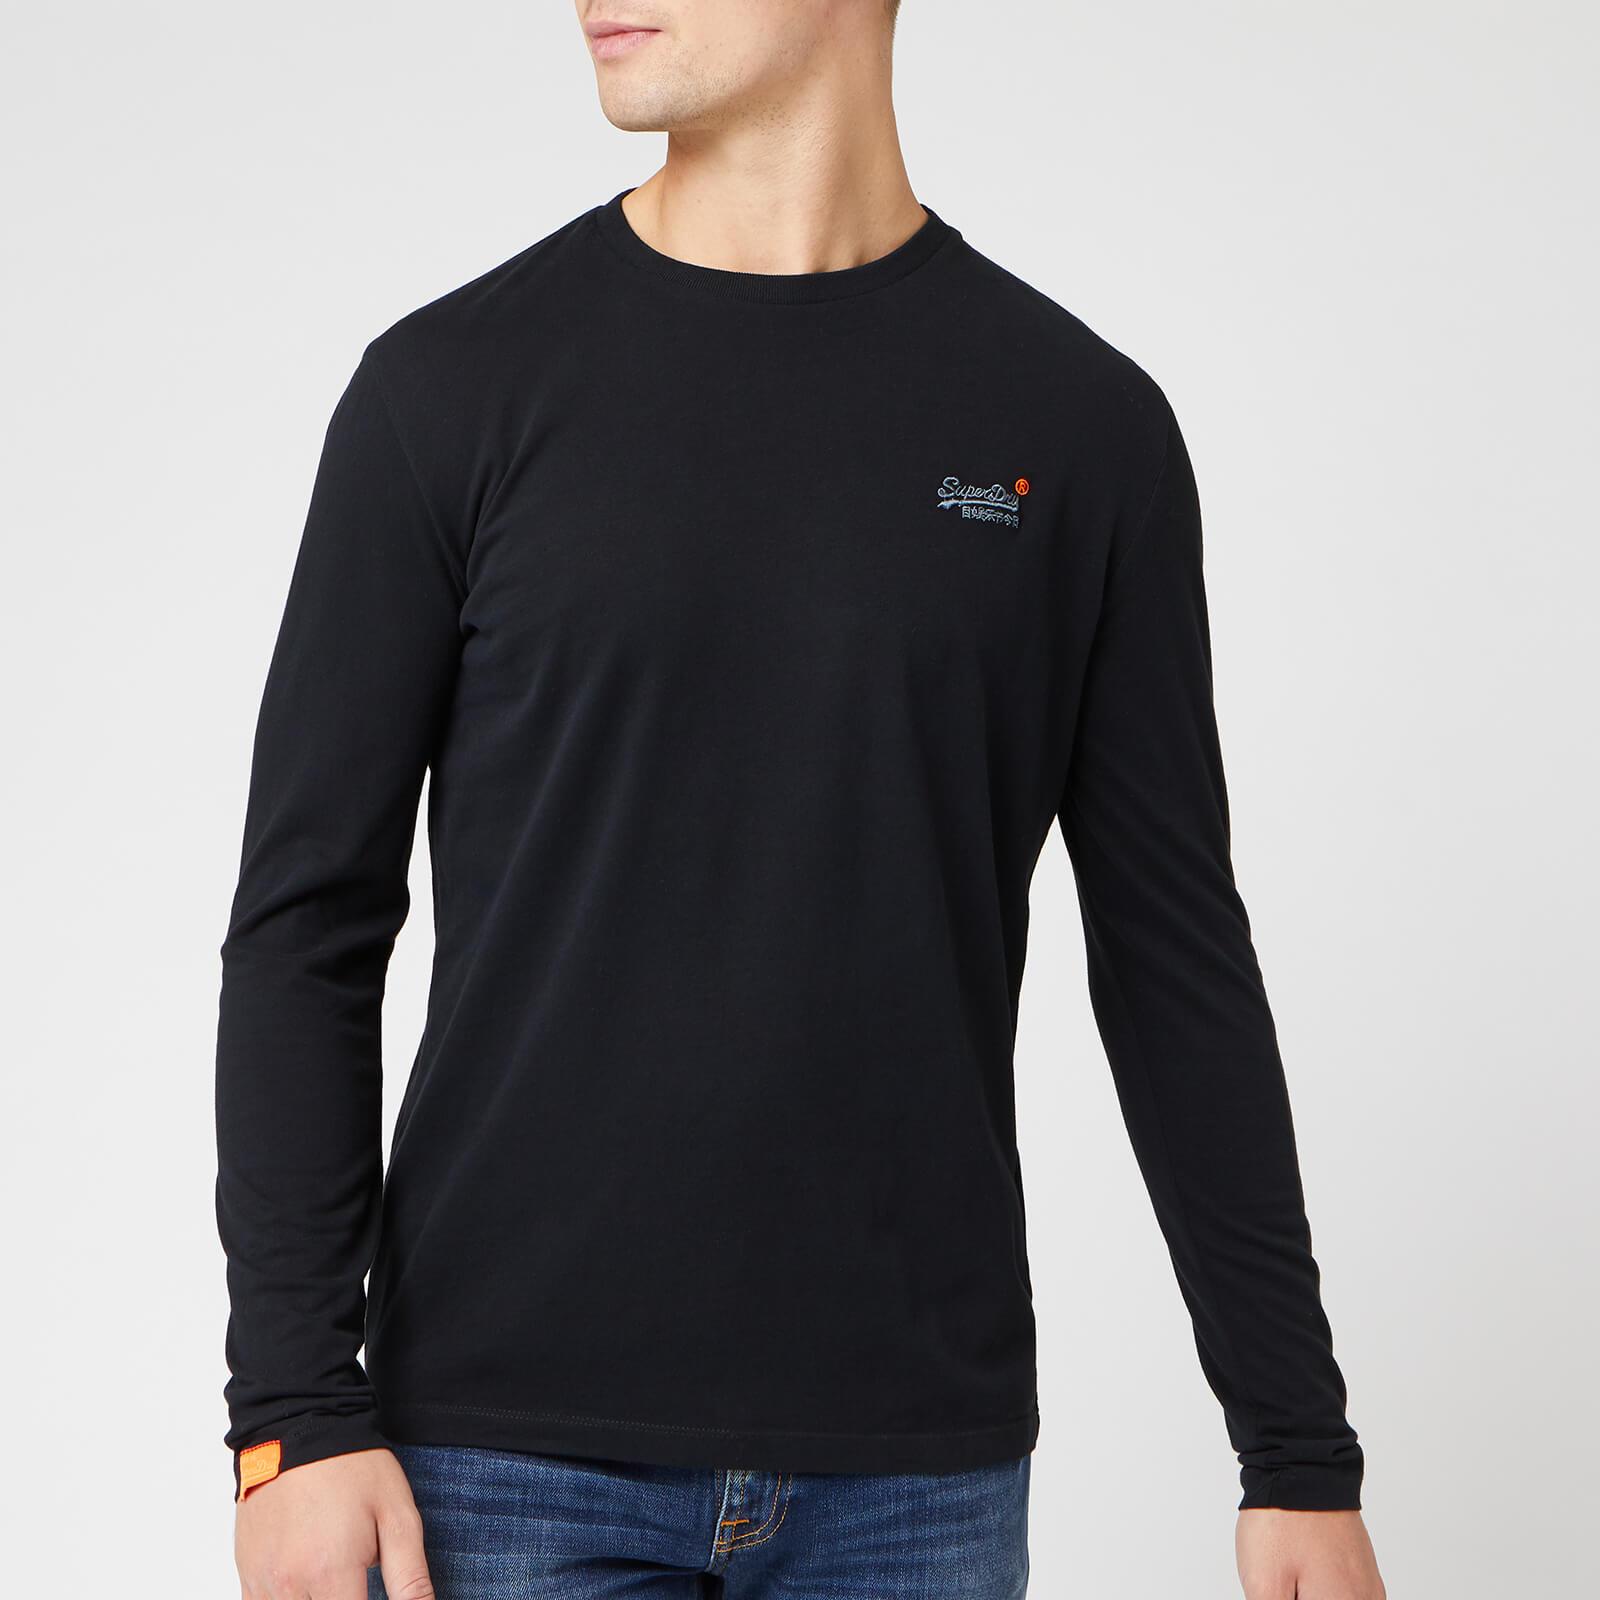 Superdry Men's O L Vintage Embroidery Long Sleeve T-Shirt - Black - L